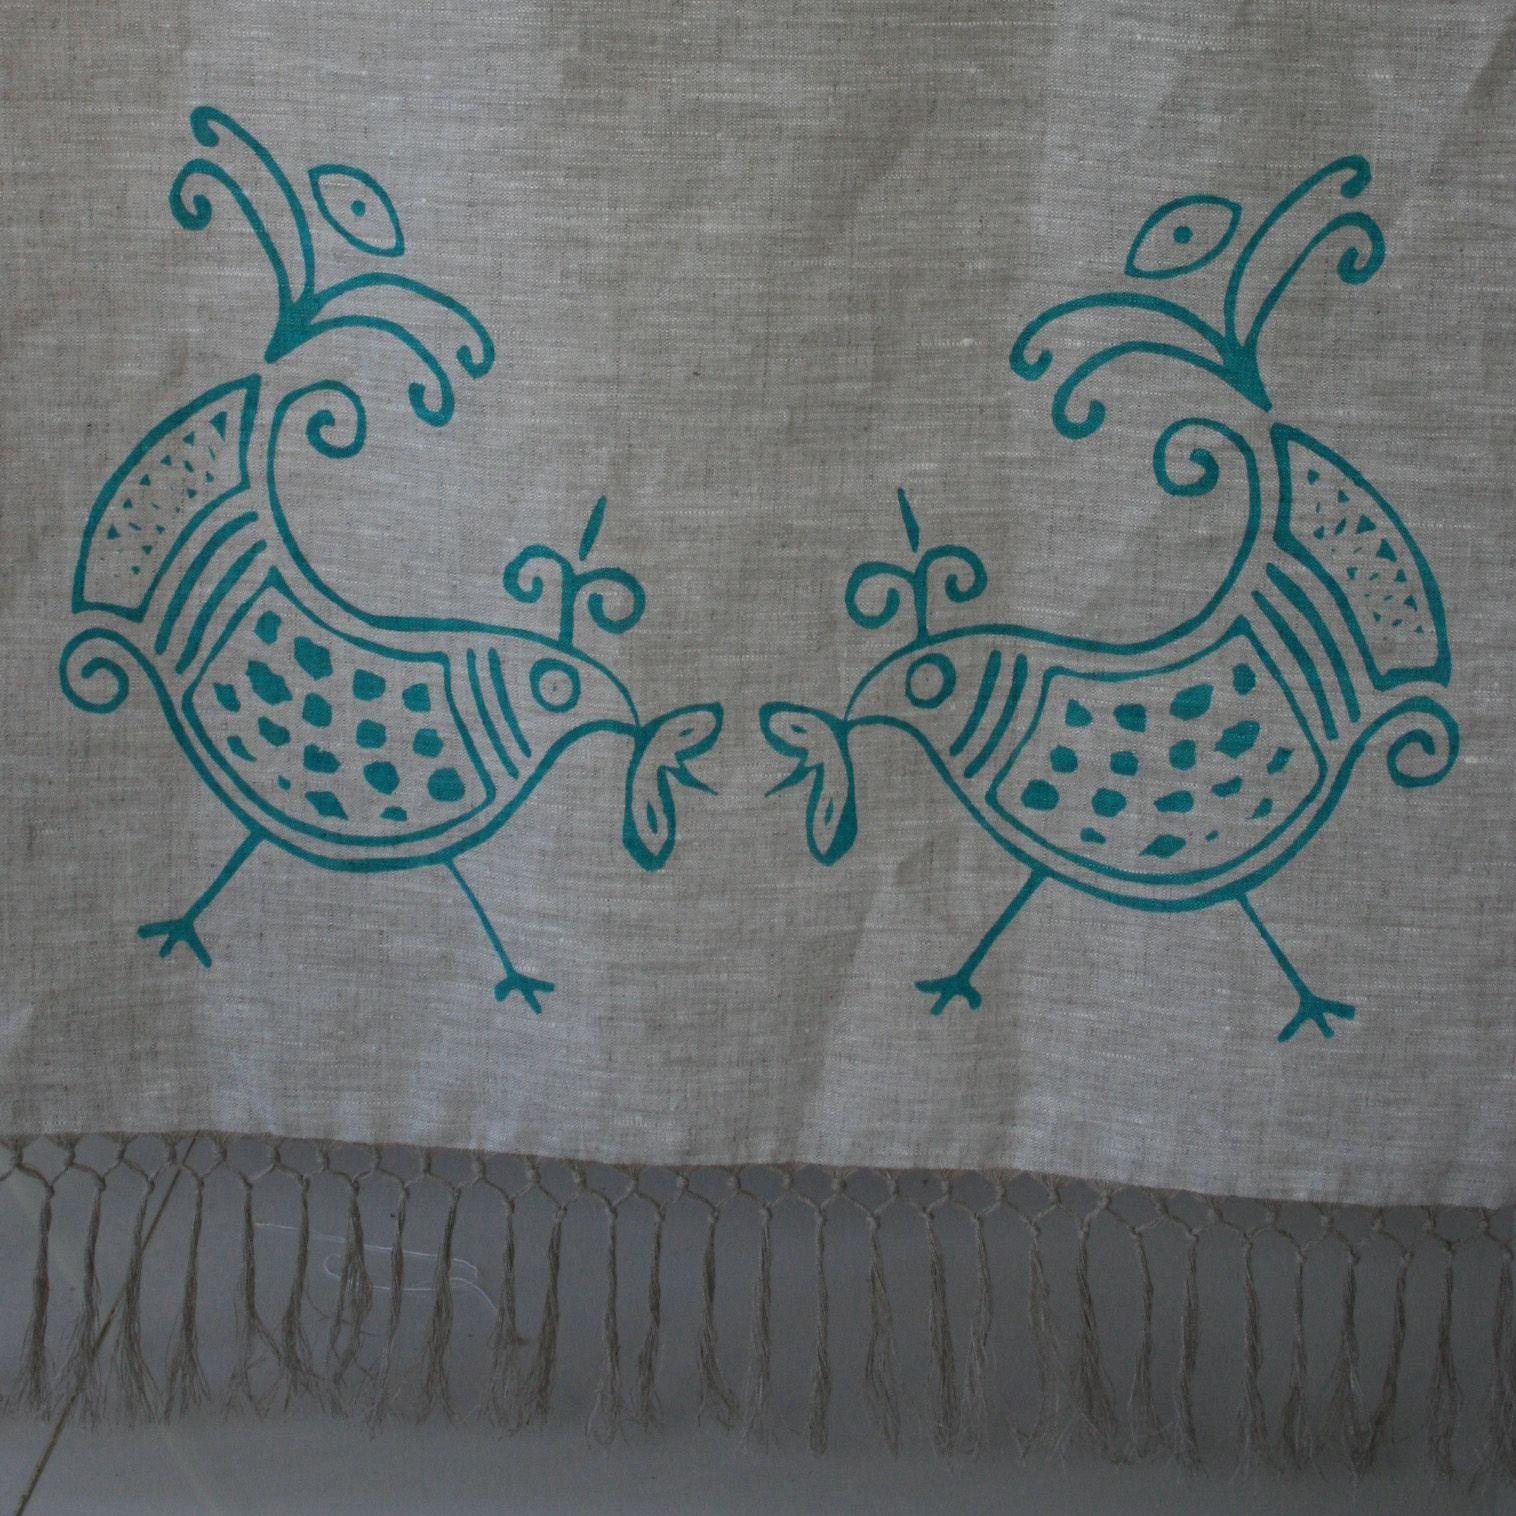 asciugamano viso in lino naturale, 120 x 60 cm